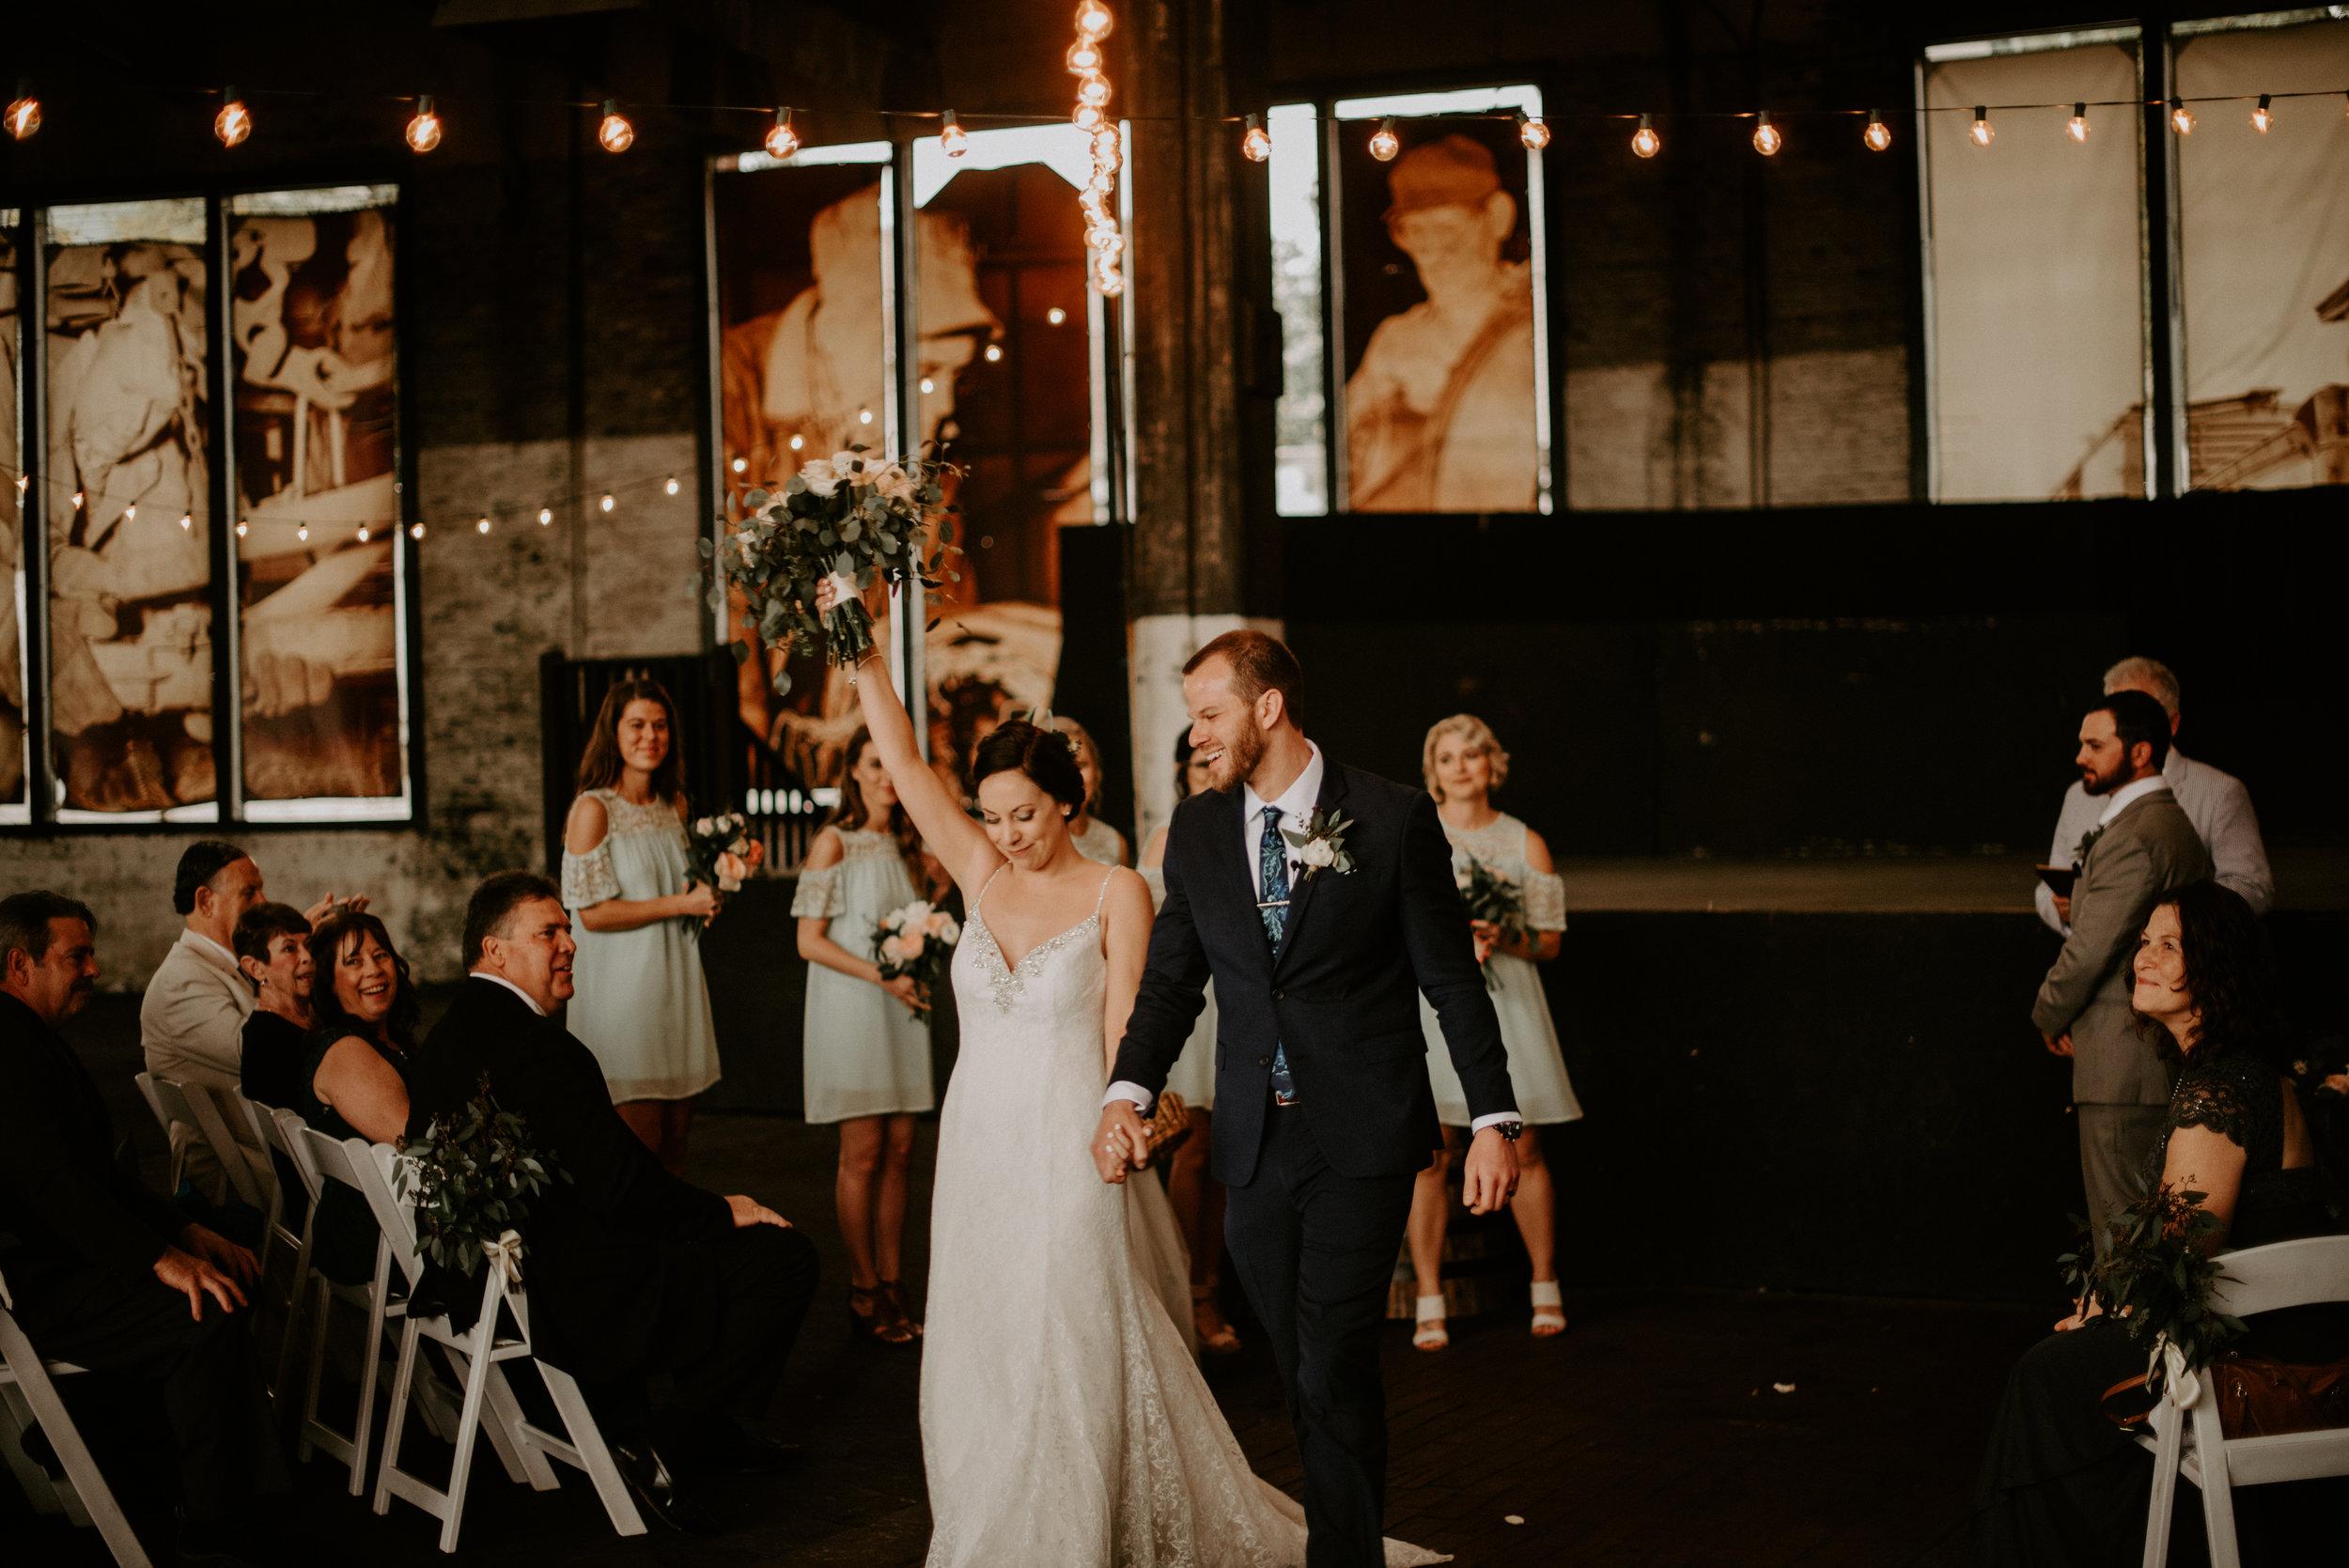 savannah-bridal-shop-andrea-and-mike-evergold-photography-georgia-state-railroad-museum-wedding-savannah-wedding-florist-savannah-wedding-planner-31.jpg